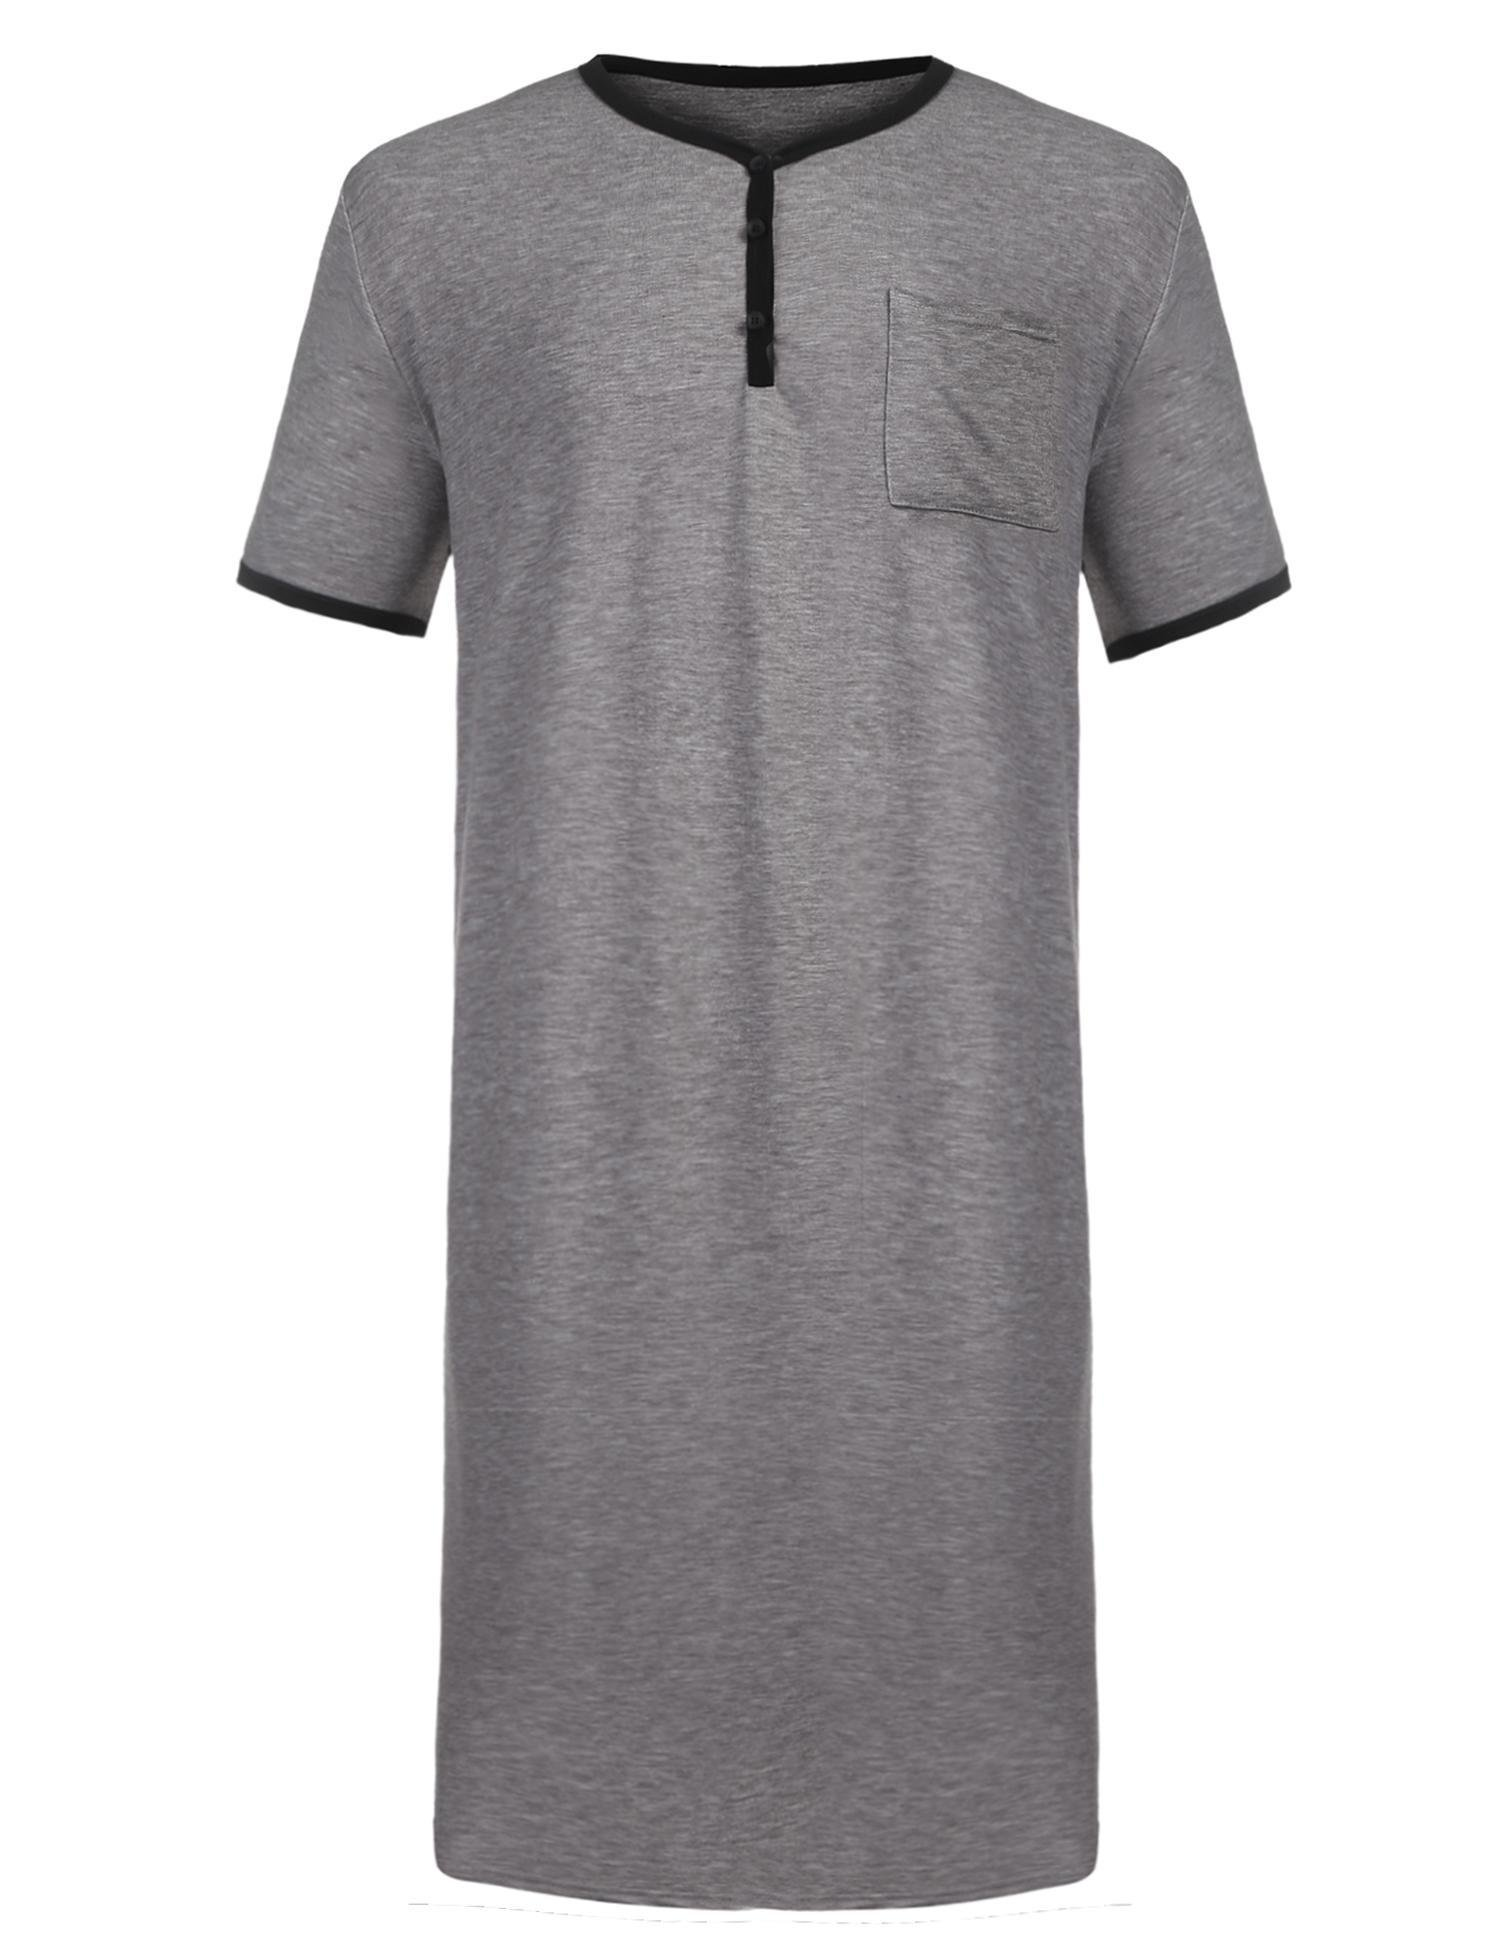 Langle Men's Nightgown Long Sleep Shirt Short Sleeve Big&Tall Nightshirt S-XXXL,Grey,XL